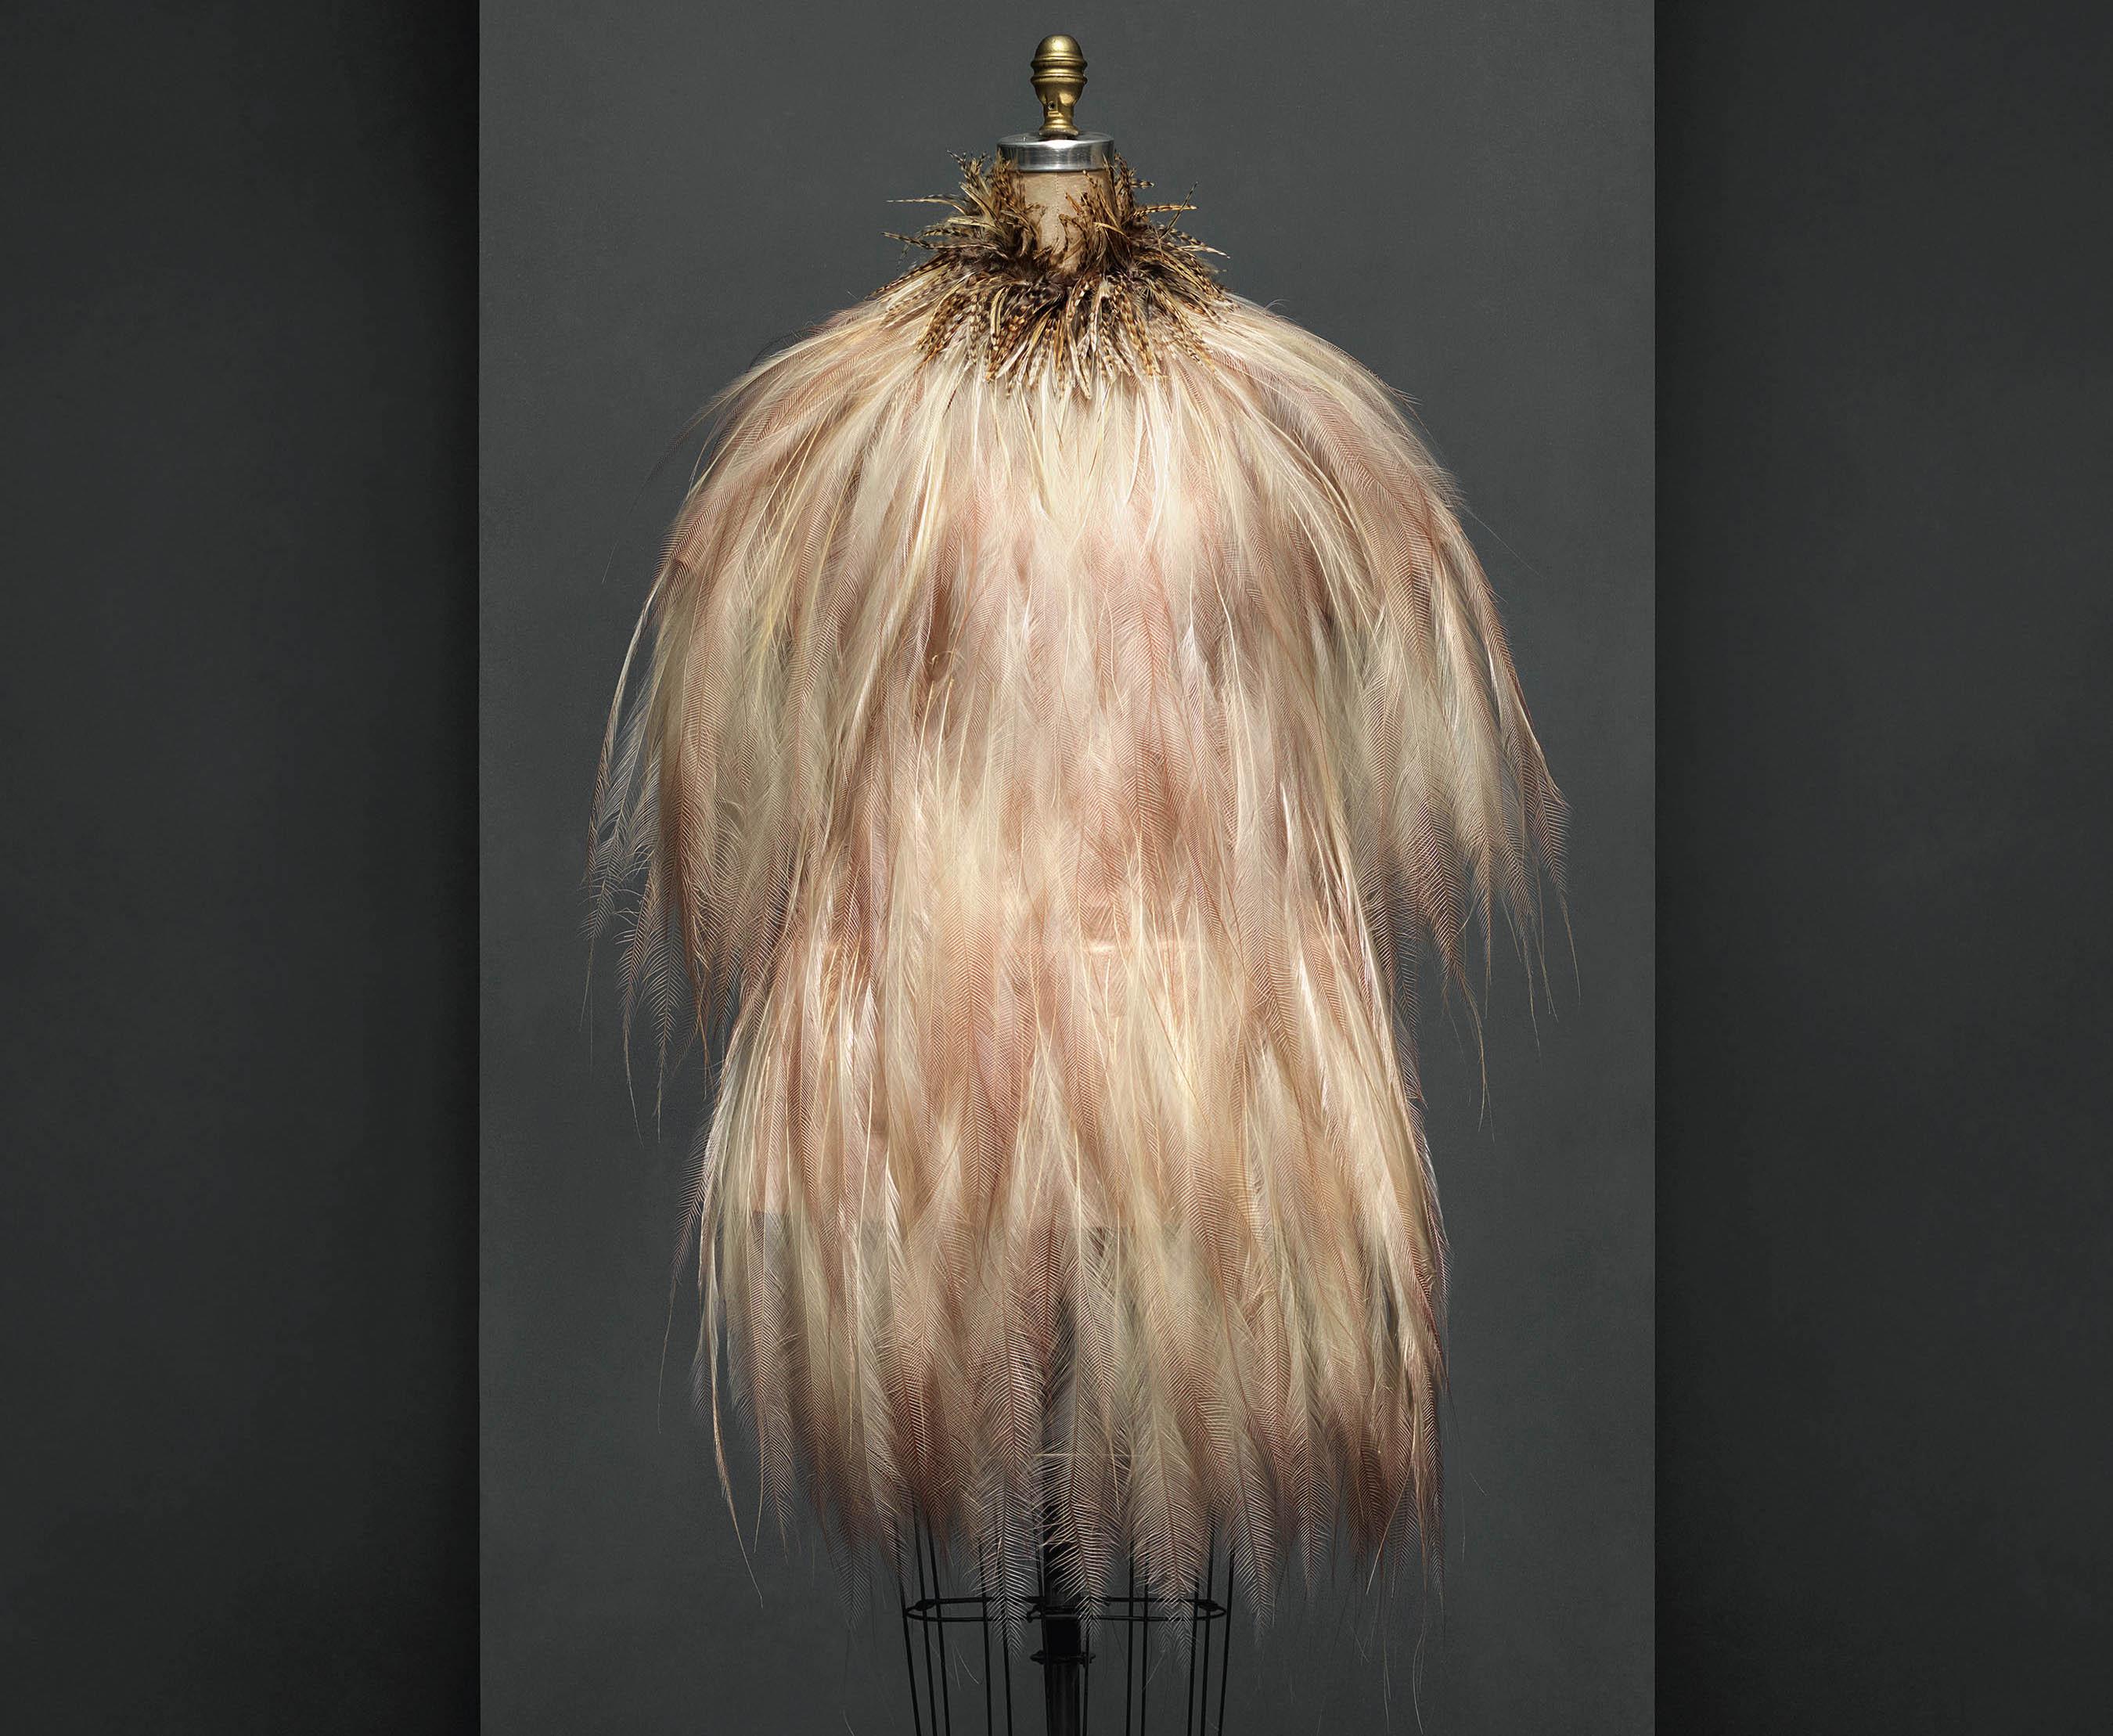 Yves Saint Laurent evening dress, 1969-70